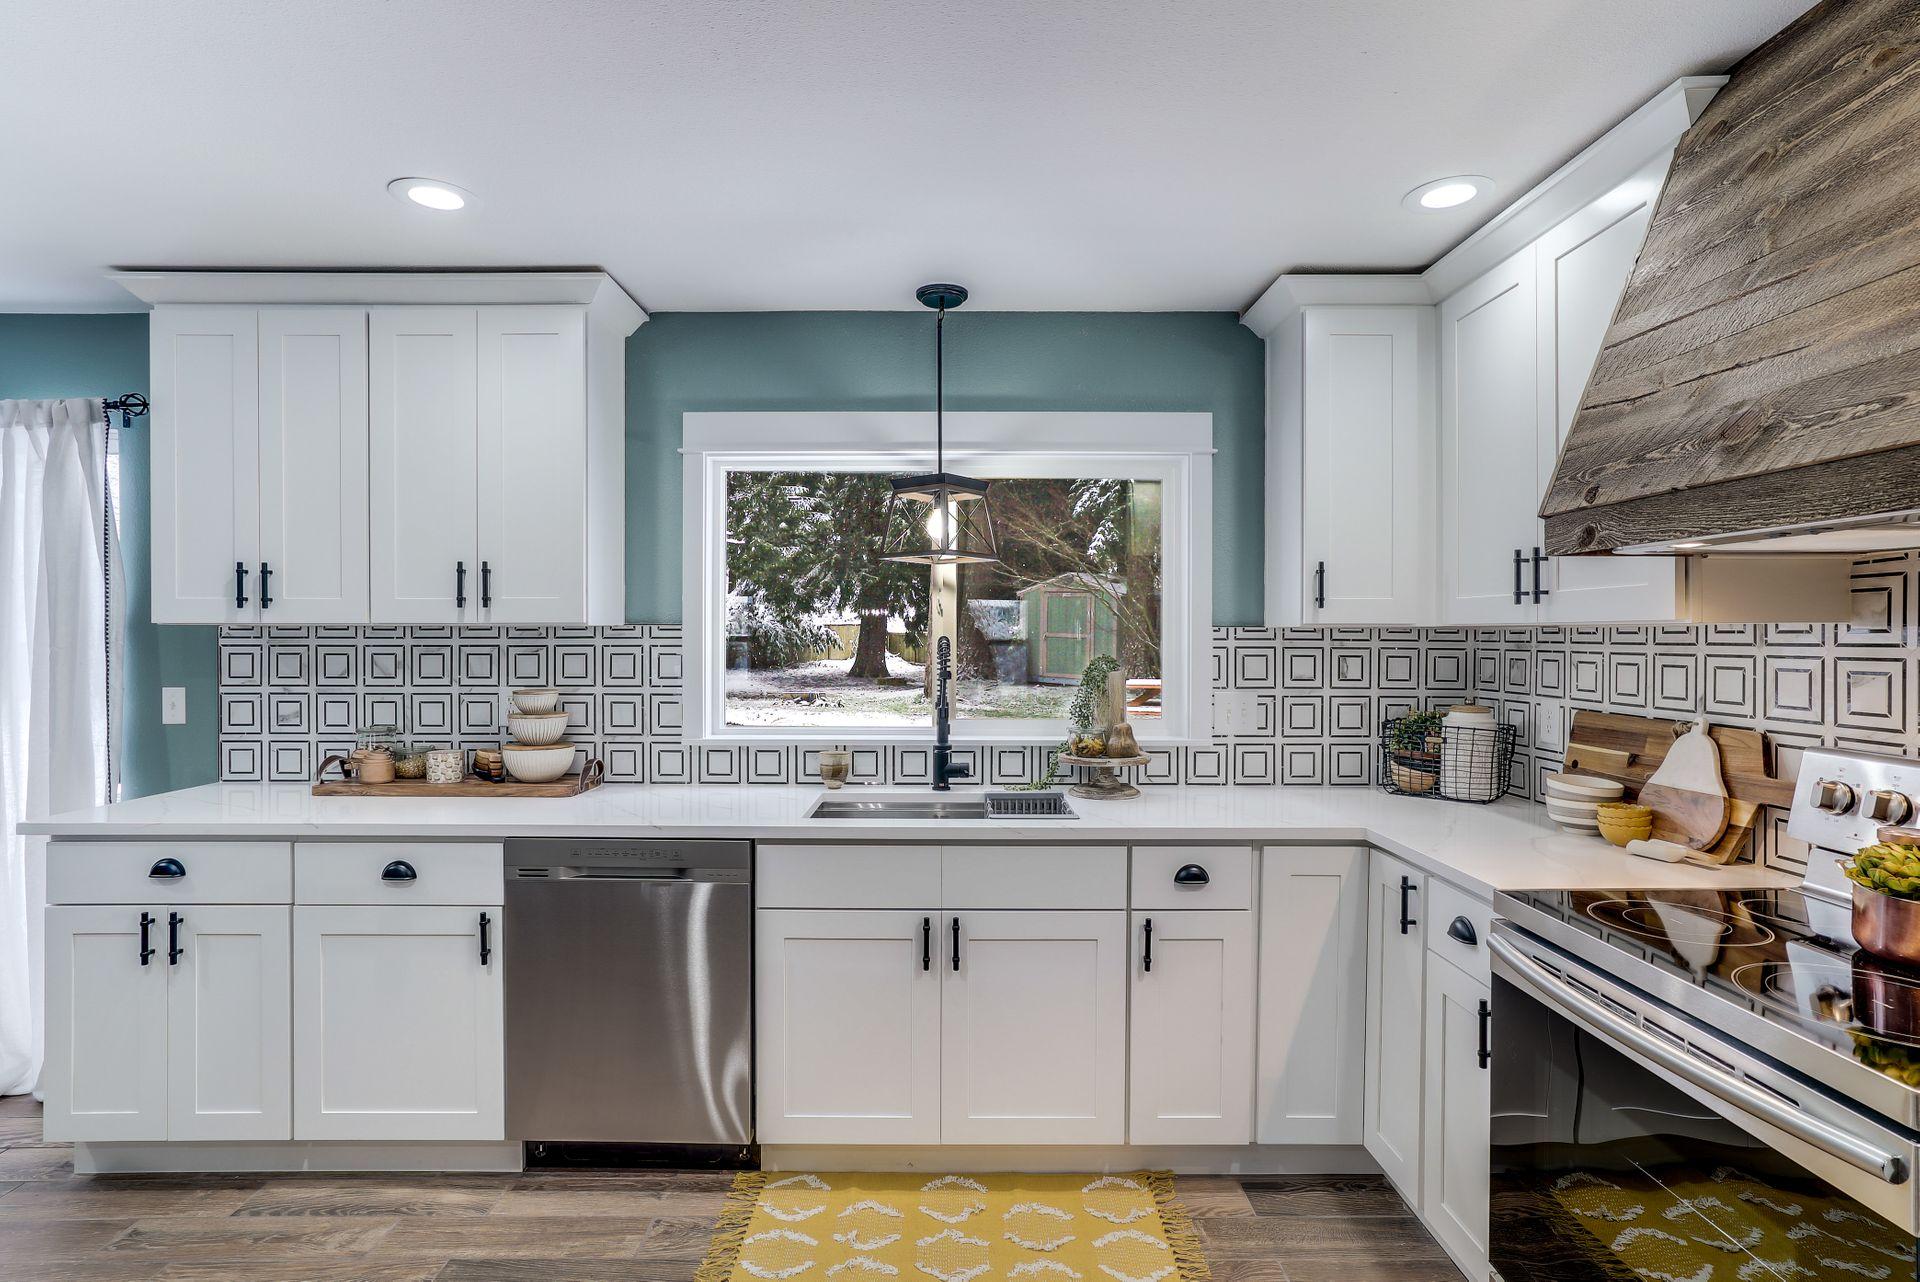 Elongated hexagon tile kitchen backsplash installed by professional tilers.